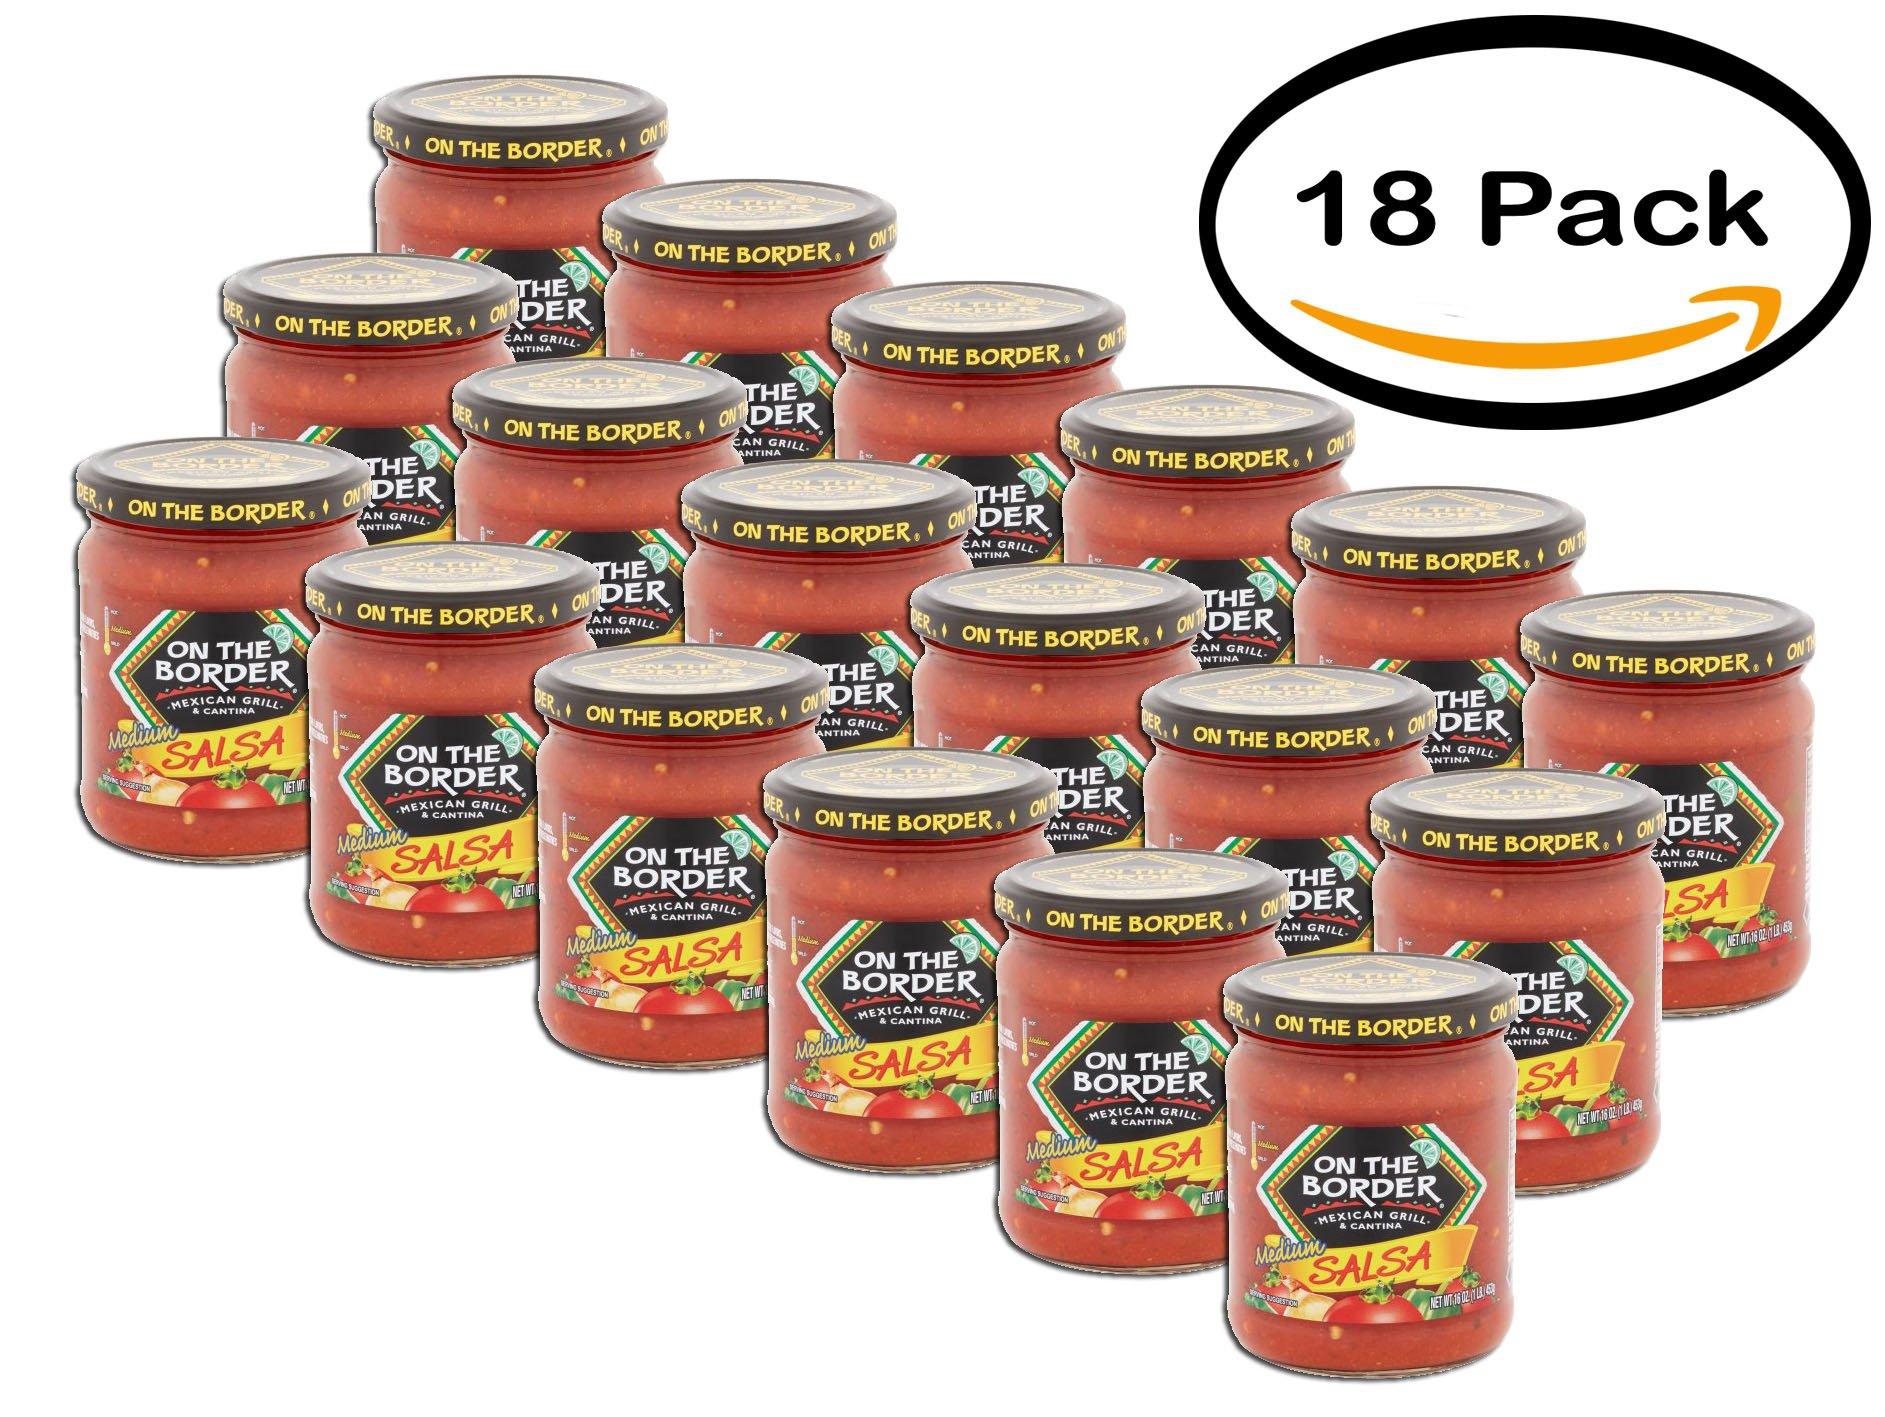 PACK OF 18 - On The Border Salsa Medium, 16.0 OZ by Border